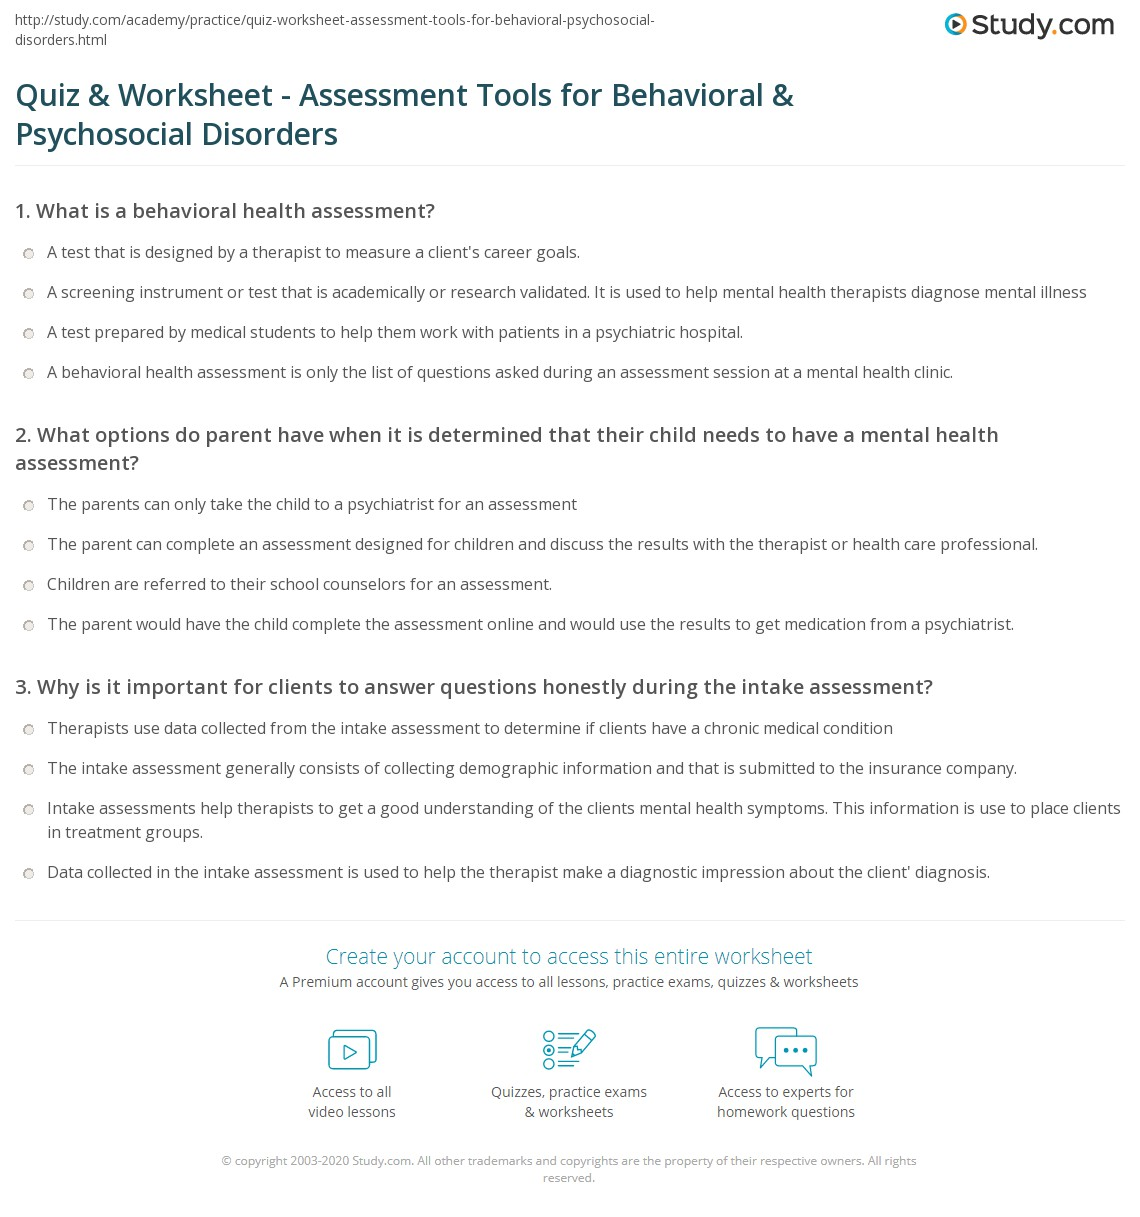 Quiz Worksheet Assessment Tools For Behavioral Psychosocial